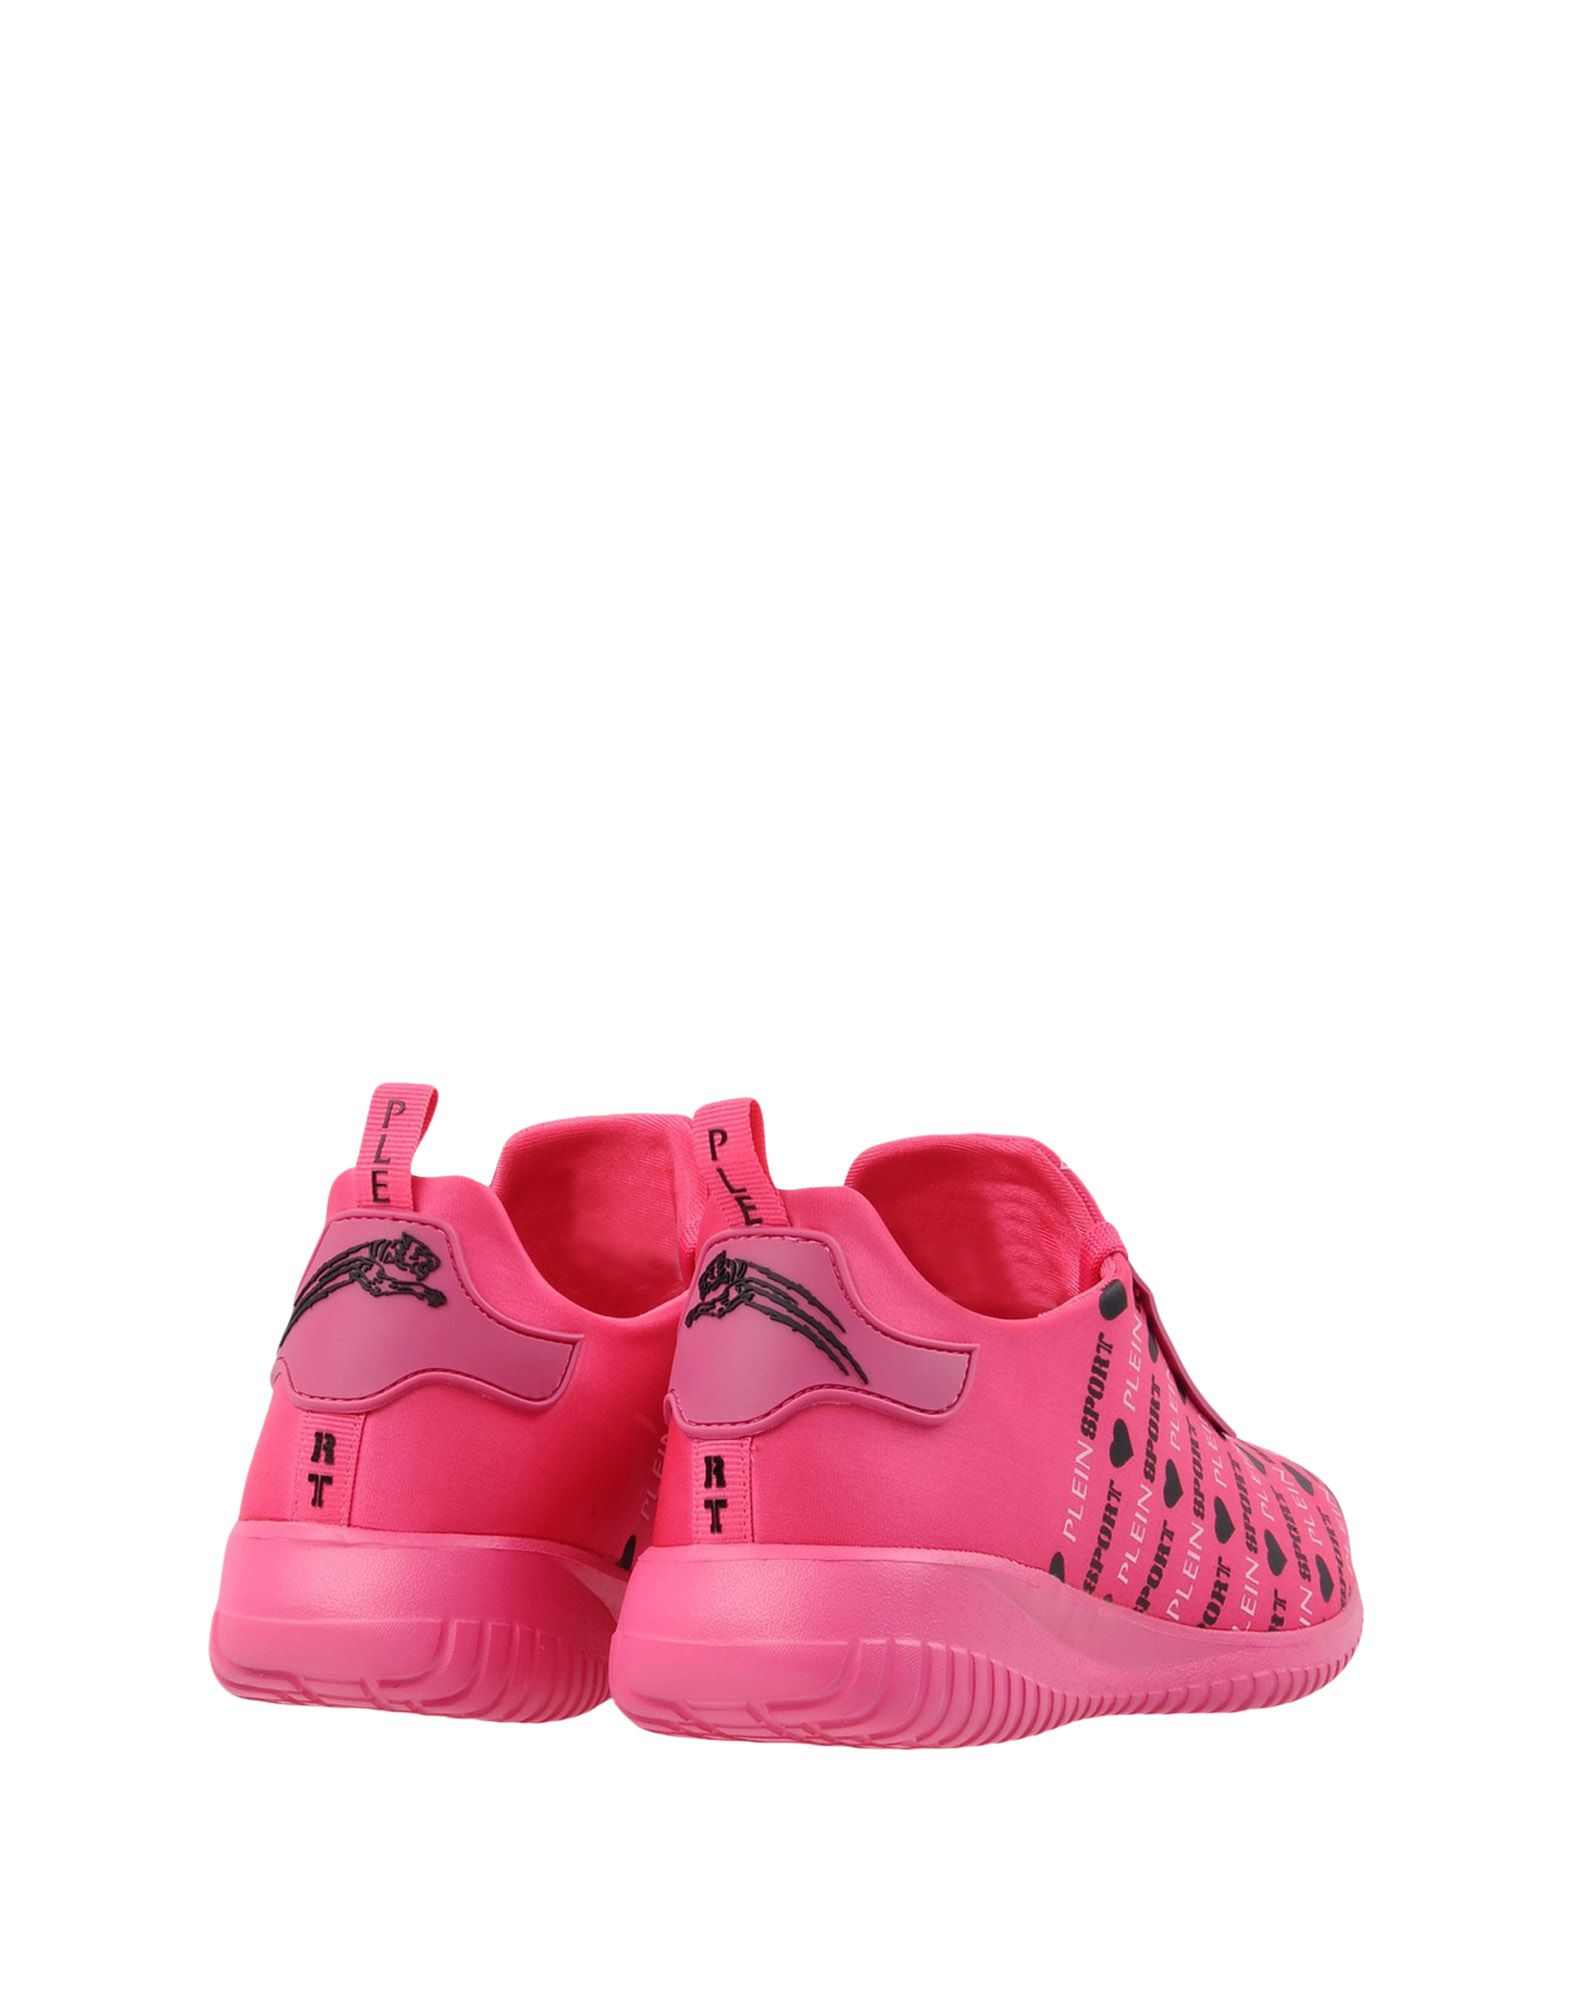 Sneakers Plein Sport Runner Cindy - Femme - Sneakers Plein Sport sur